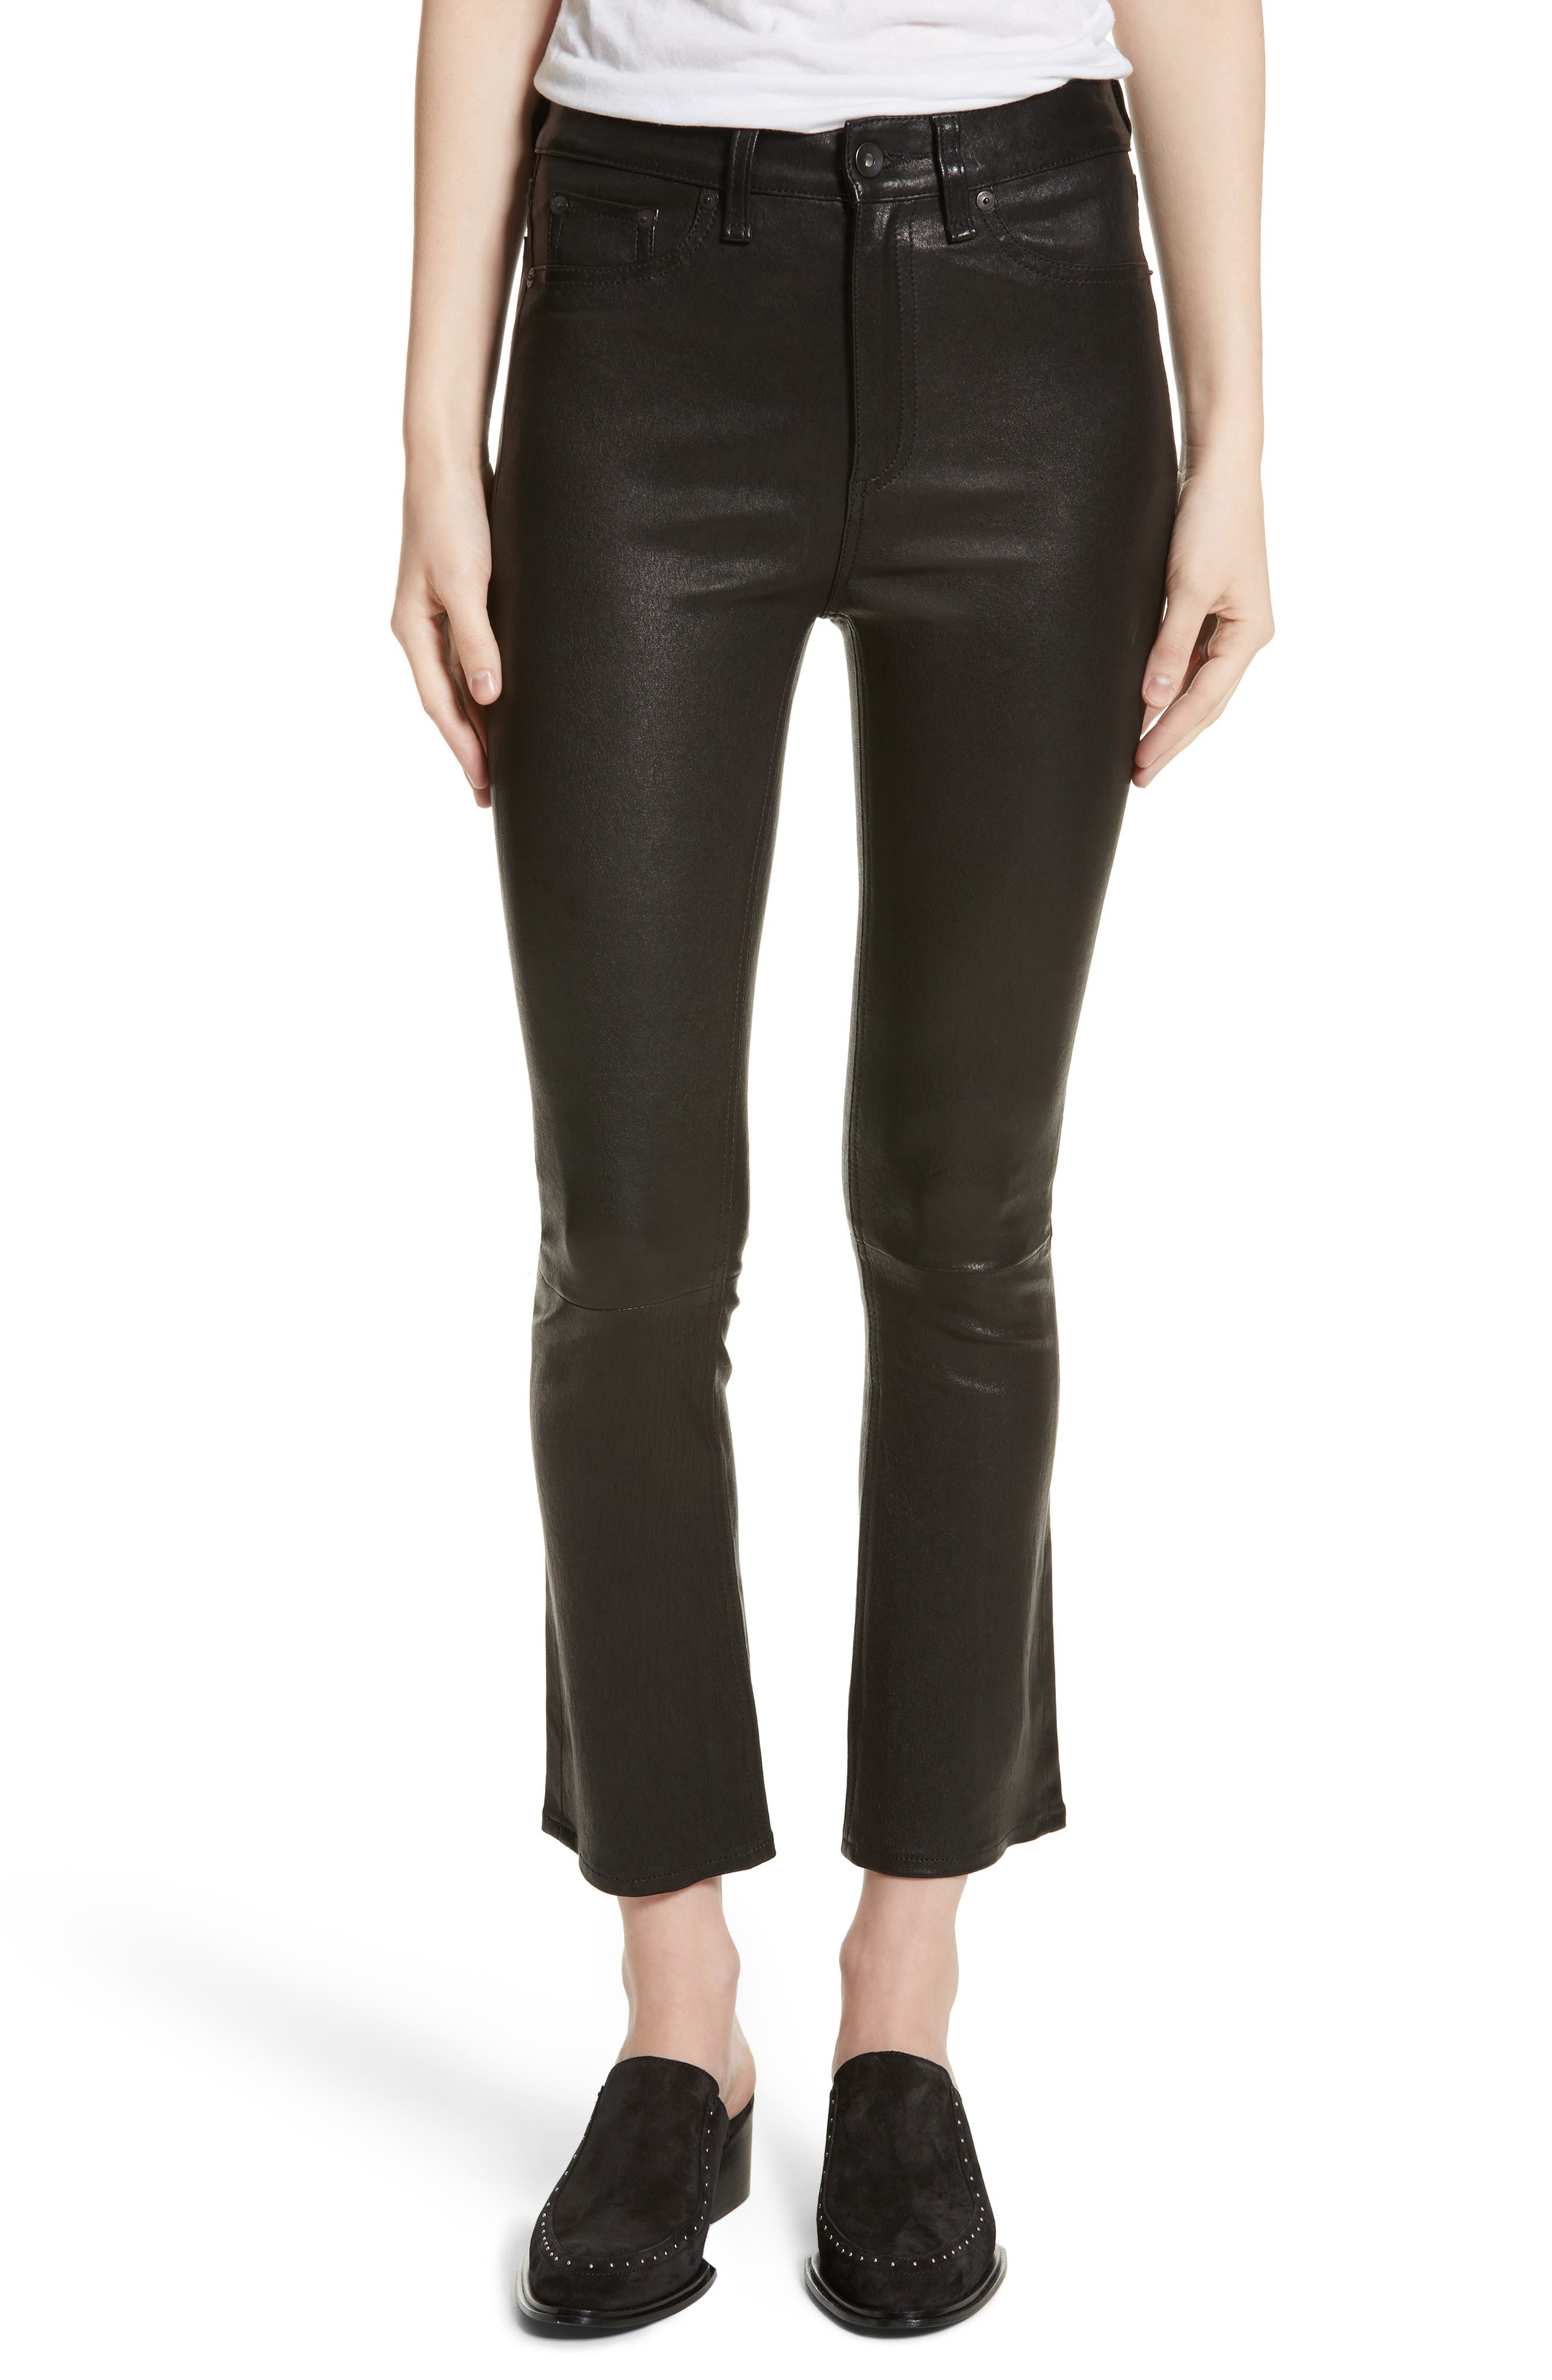 Alternate Image 1 Selected - rag & bone/JEAN Hana Crop Flare Leather Pants